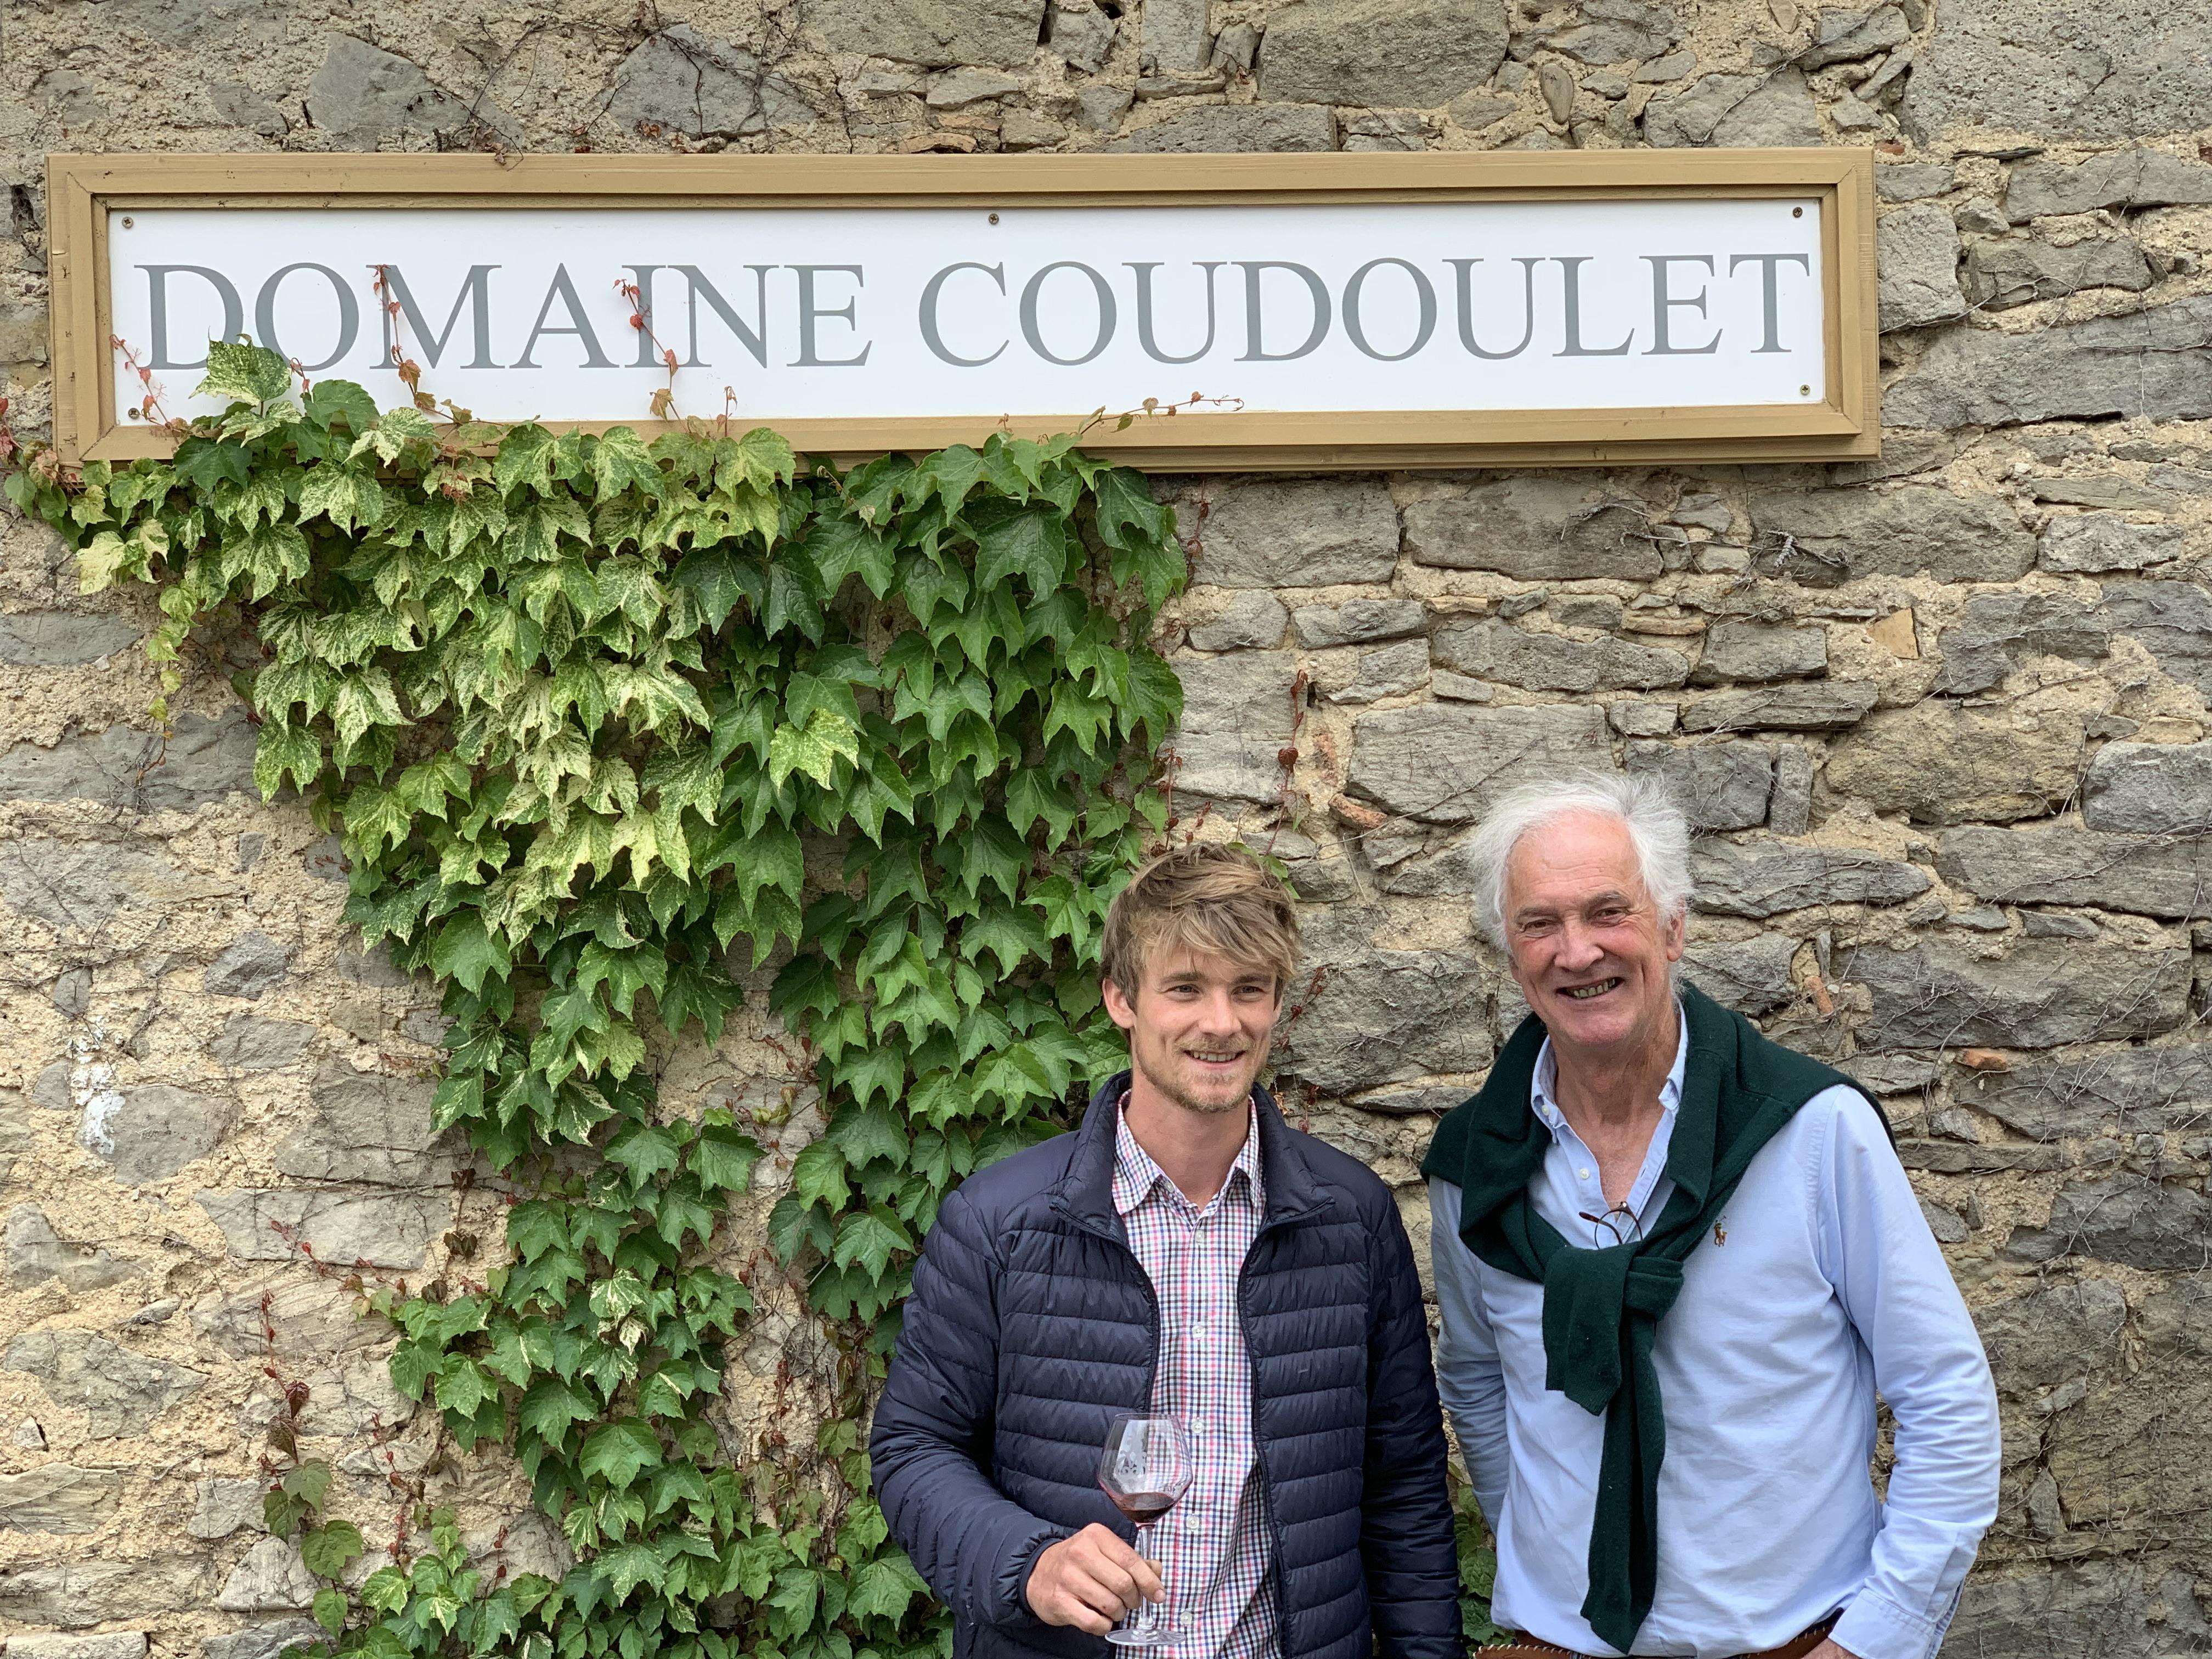 Domaine Coudoulet